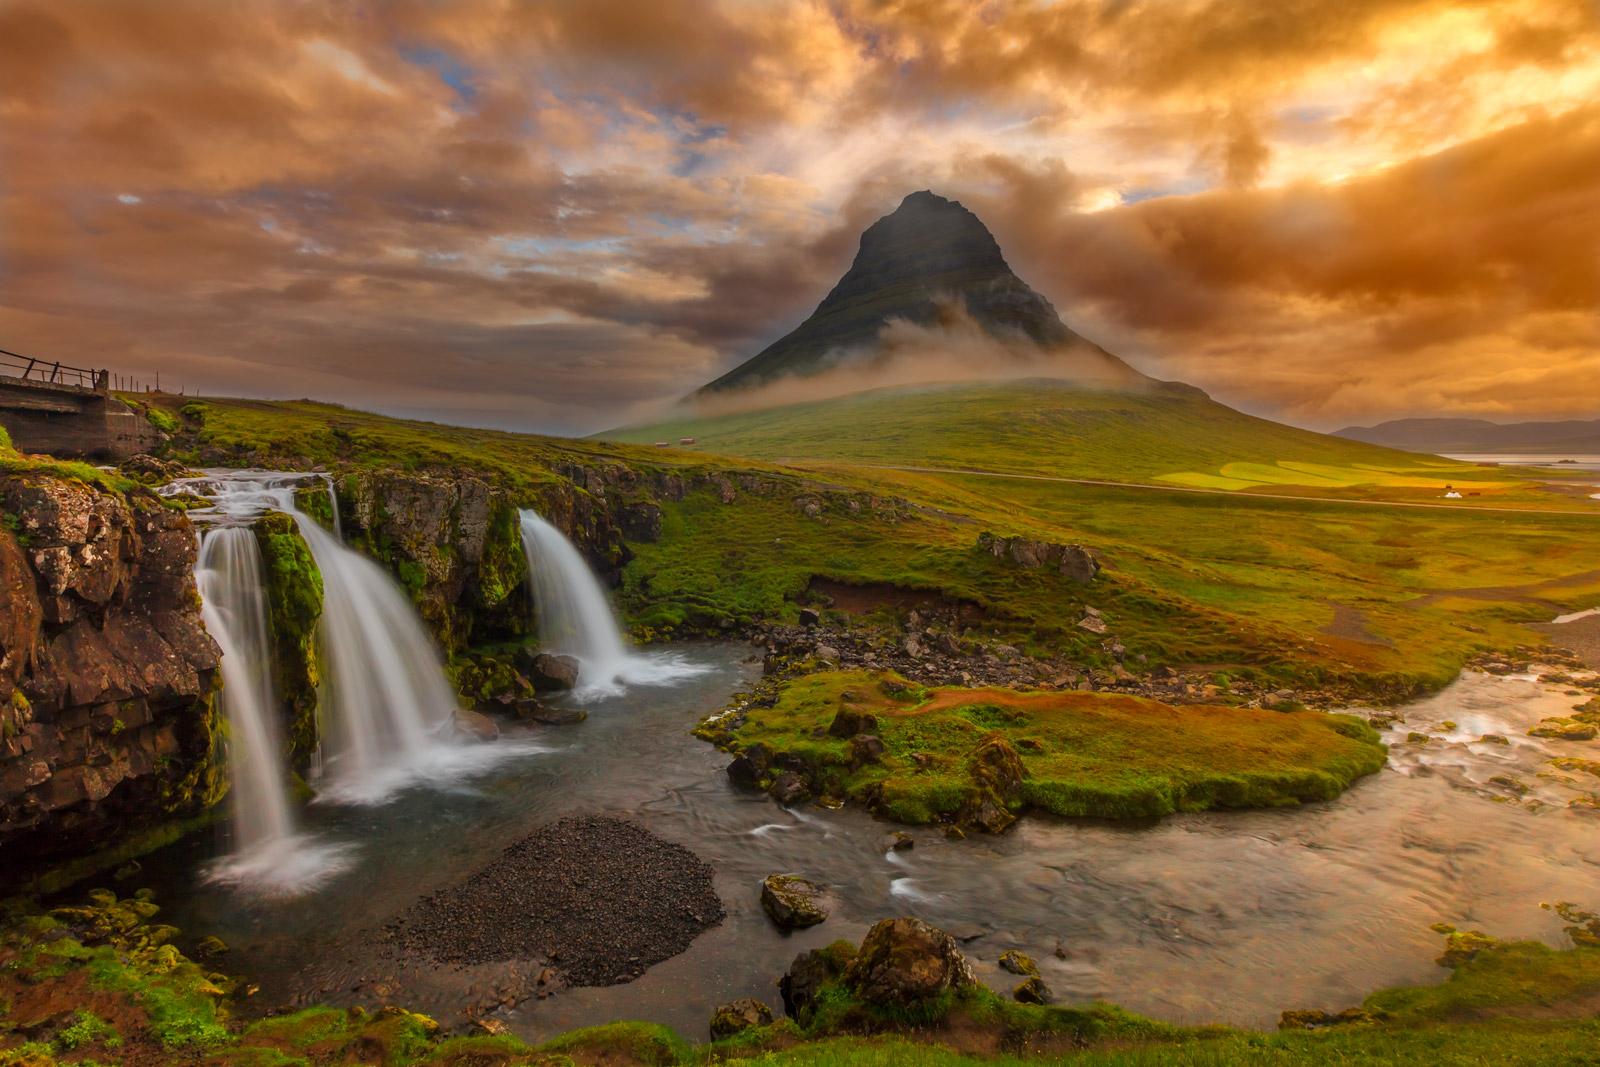 iceland, waterfall, kirkjufellfoss, sunrise, limited edition, photograph, fine art, landscape, photo